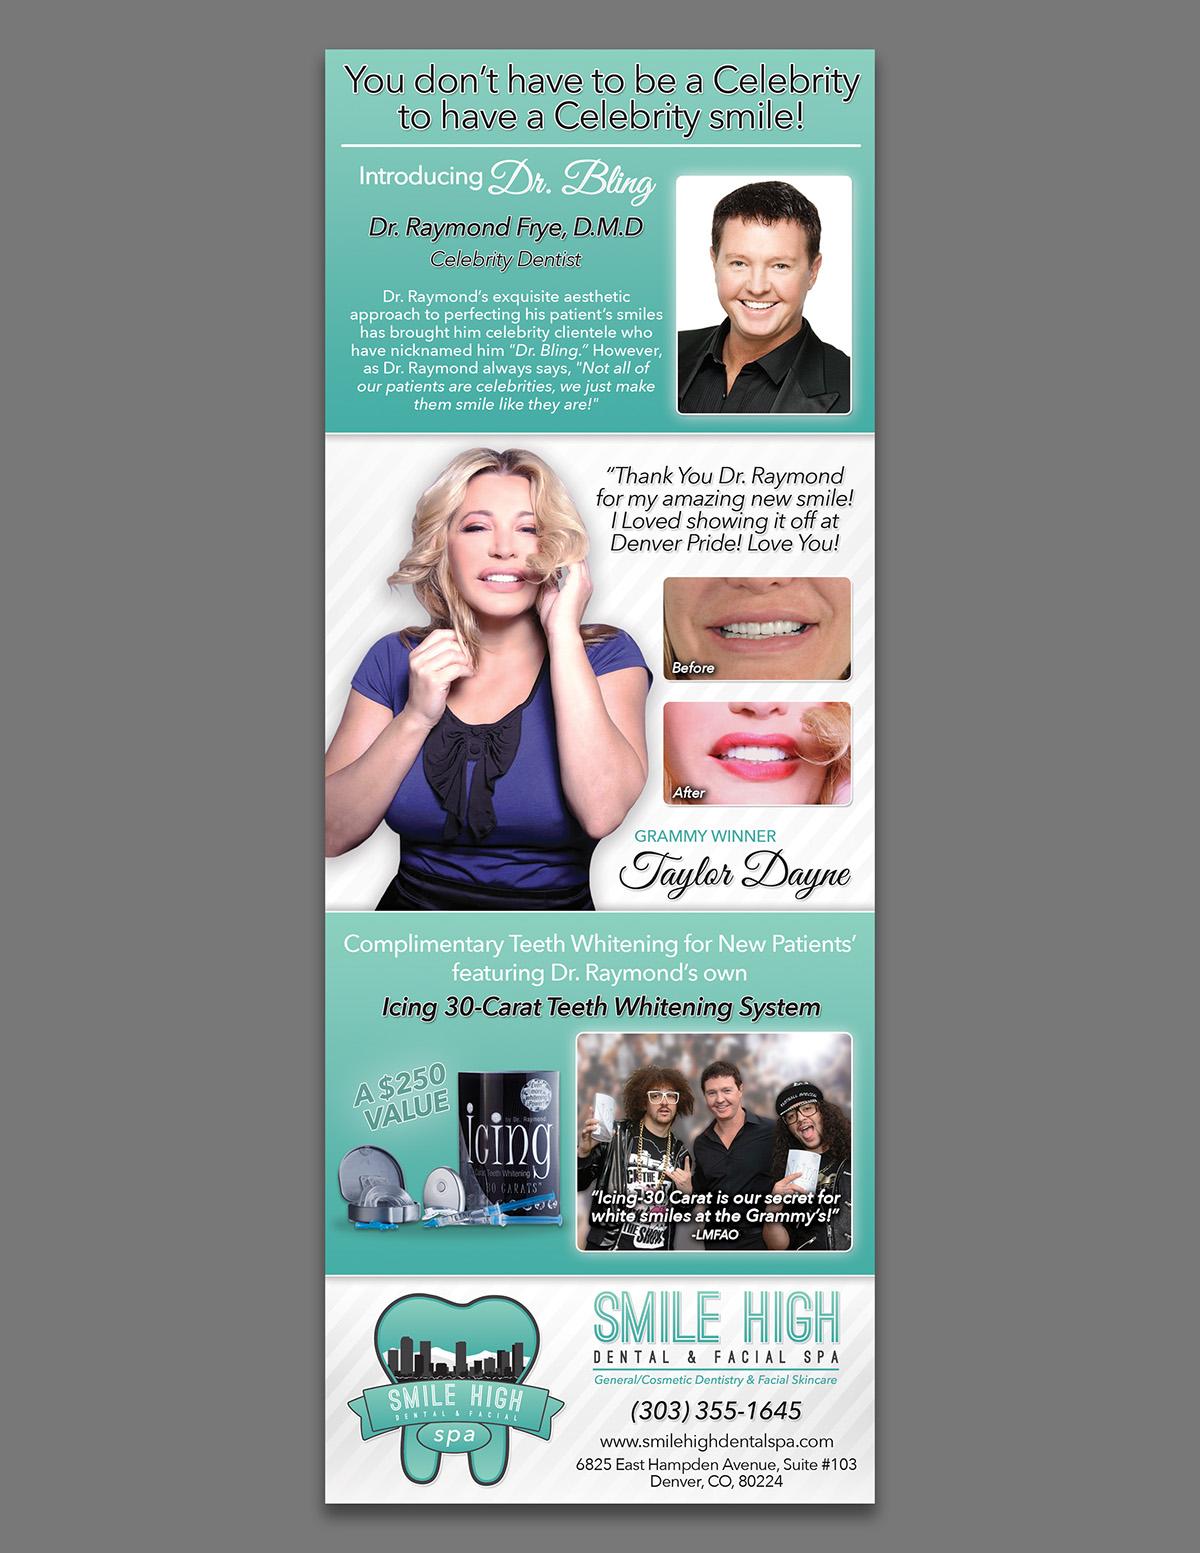 Print Advertisement For Smile High Facial Dental Spa